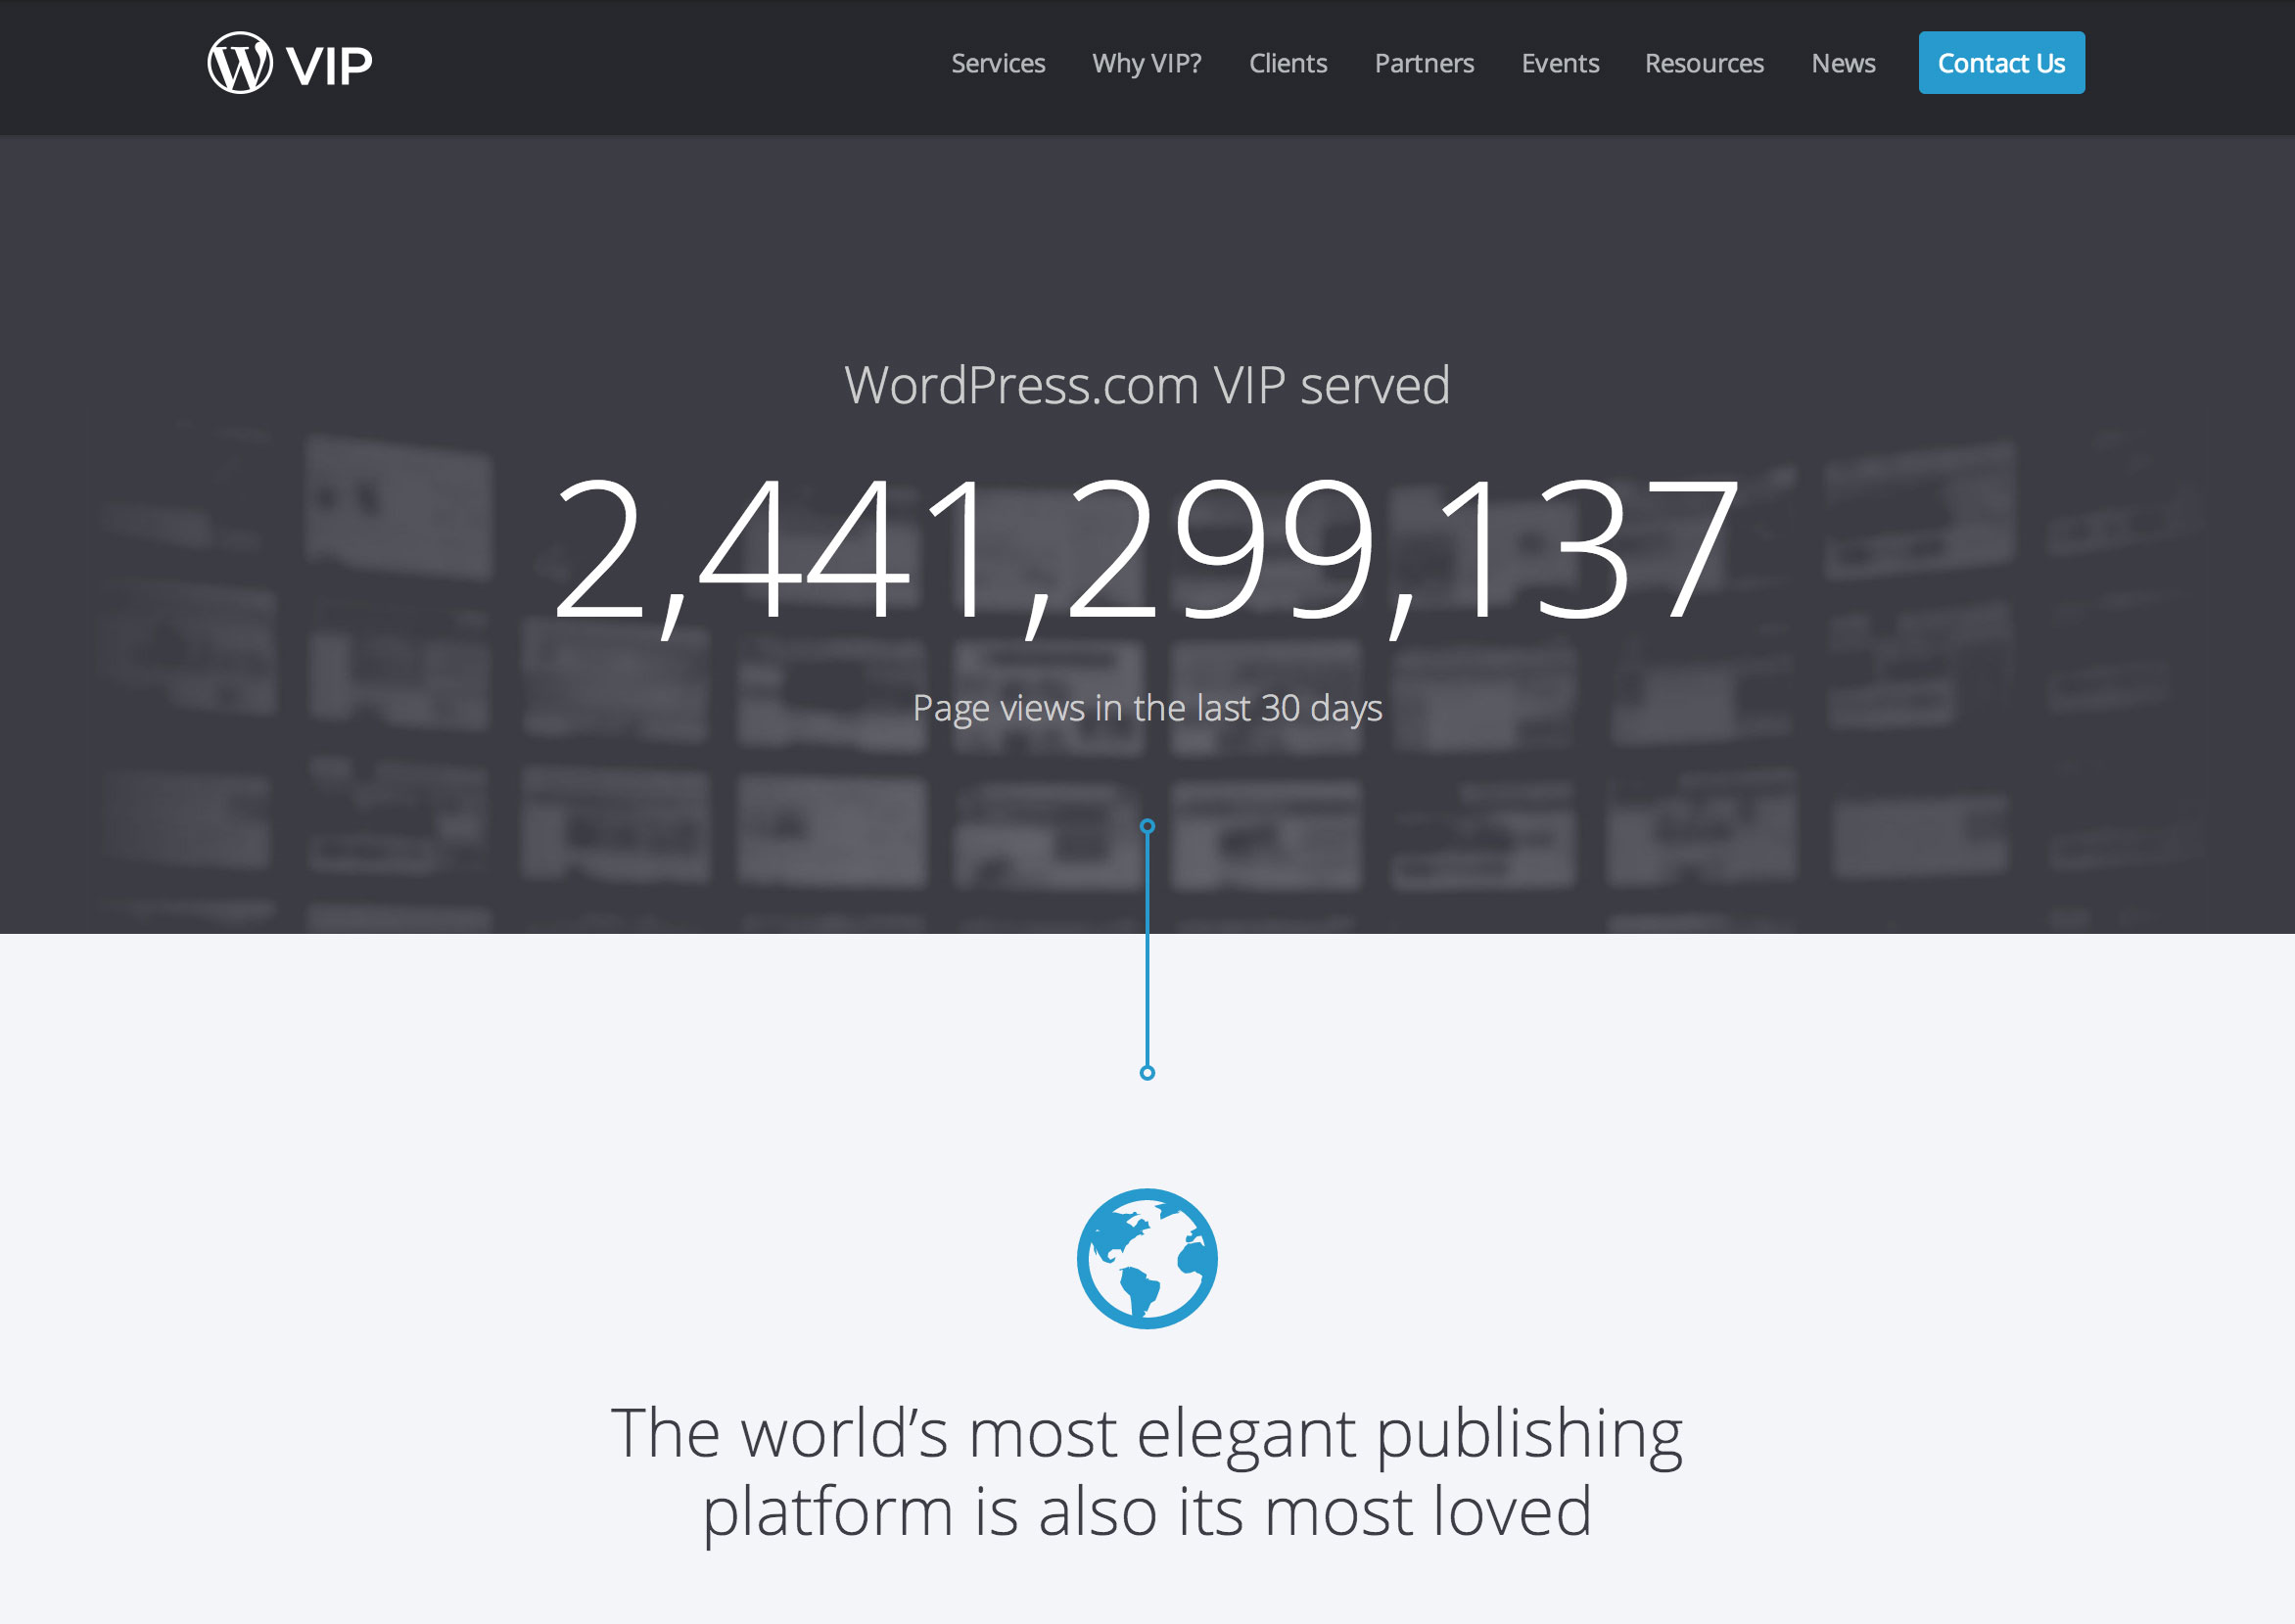 WordPress.com VIP Statistics page